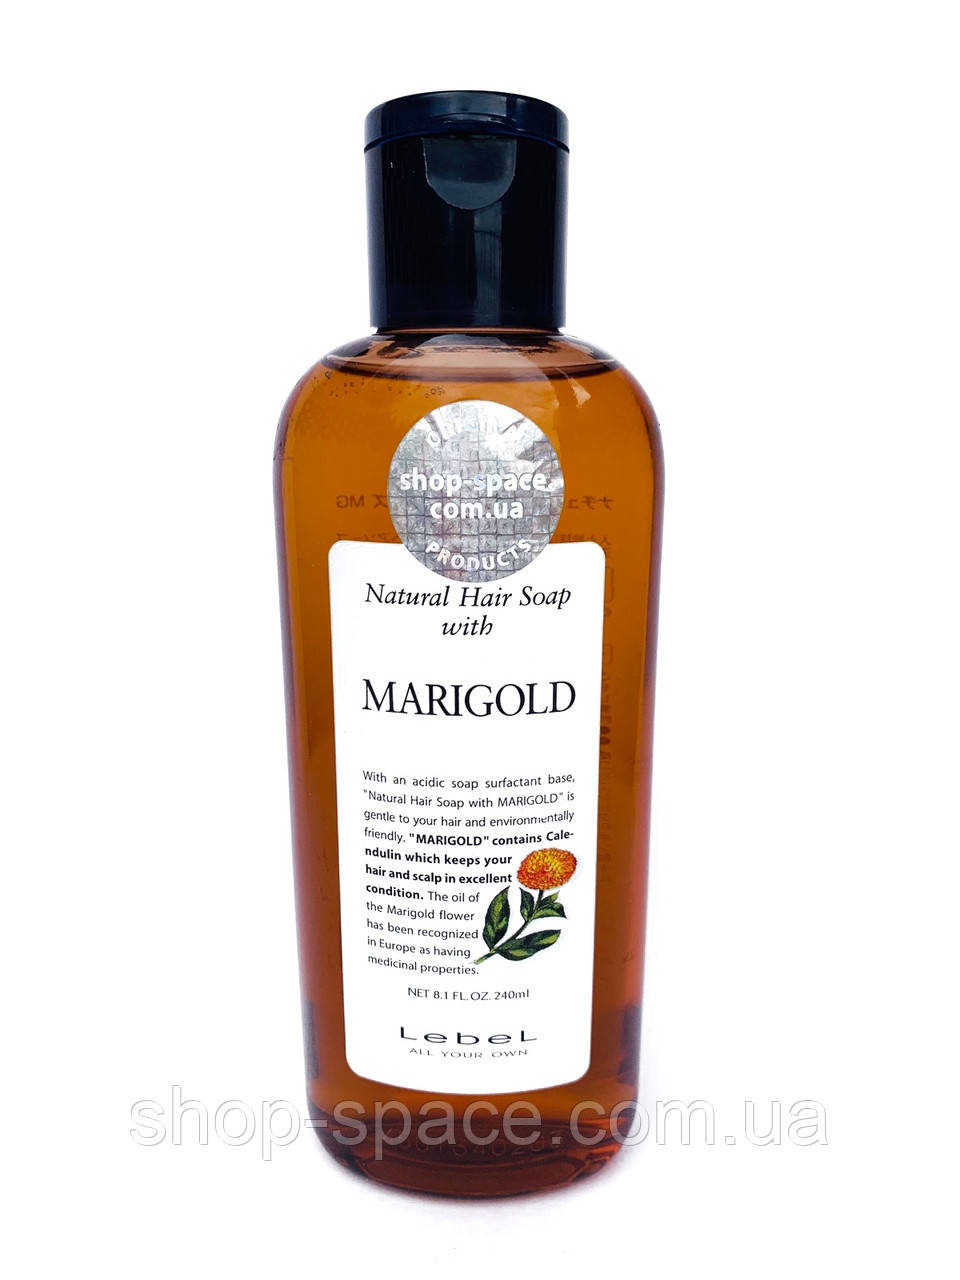 Шампунь Lebel with Marigold, с экстрактом календулы, 240 мл